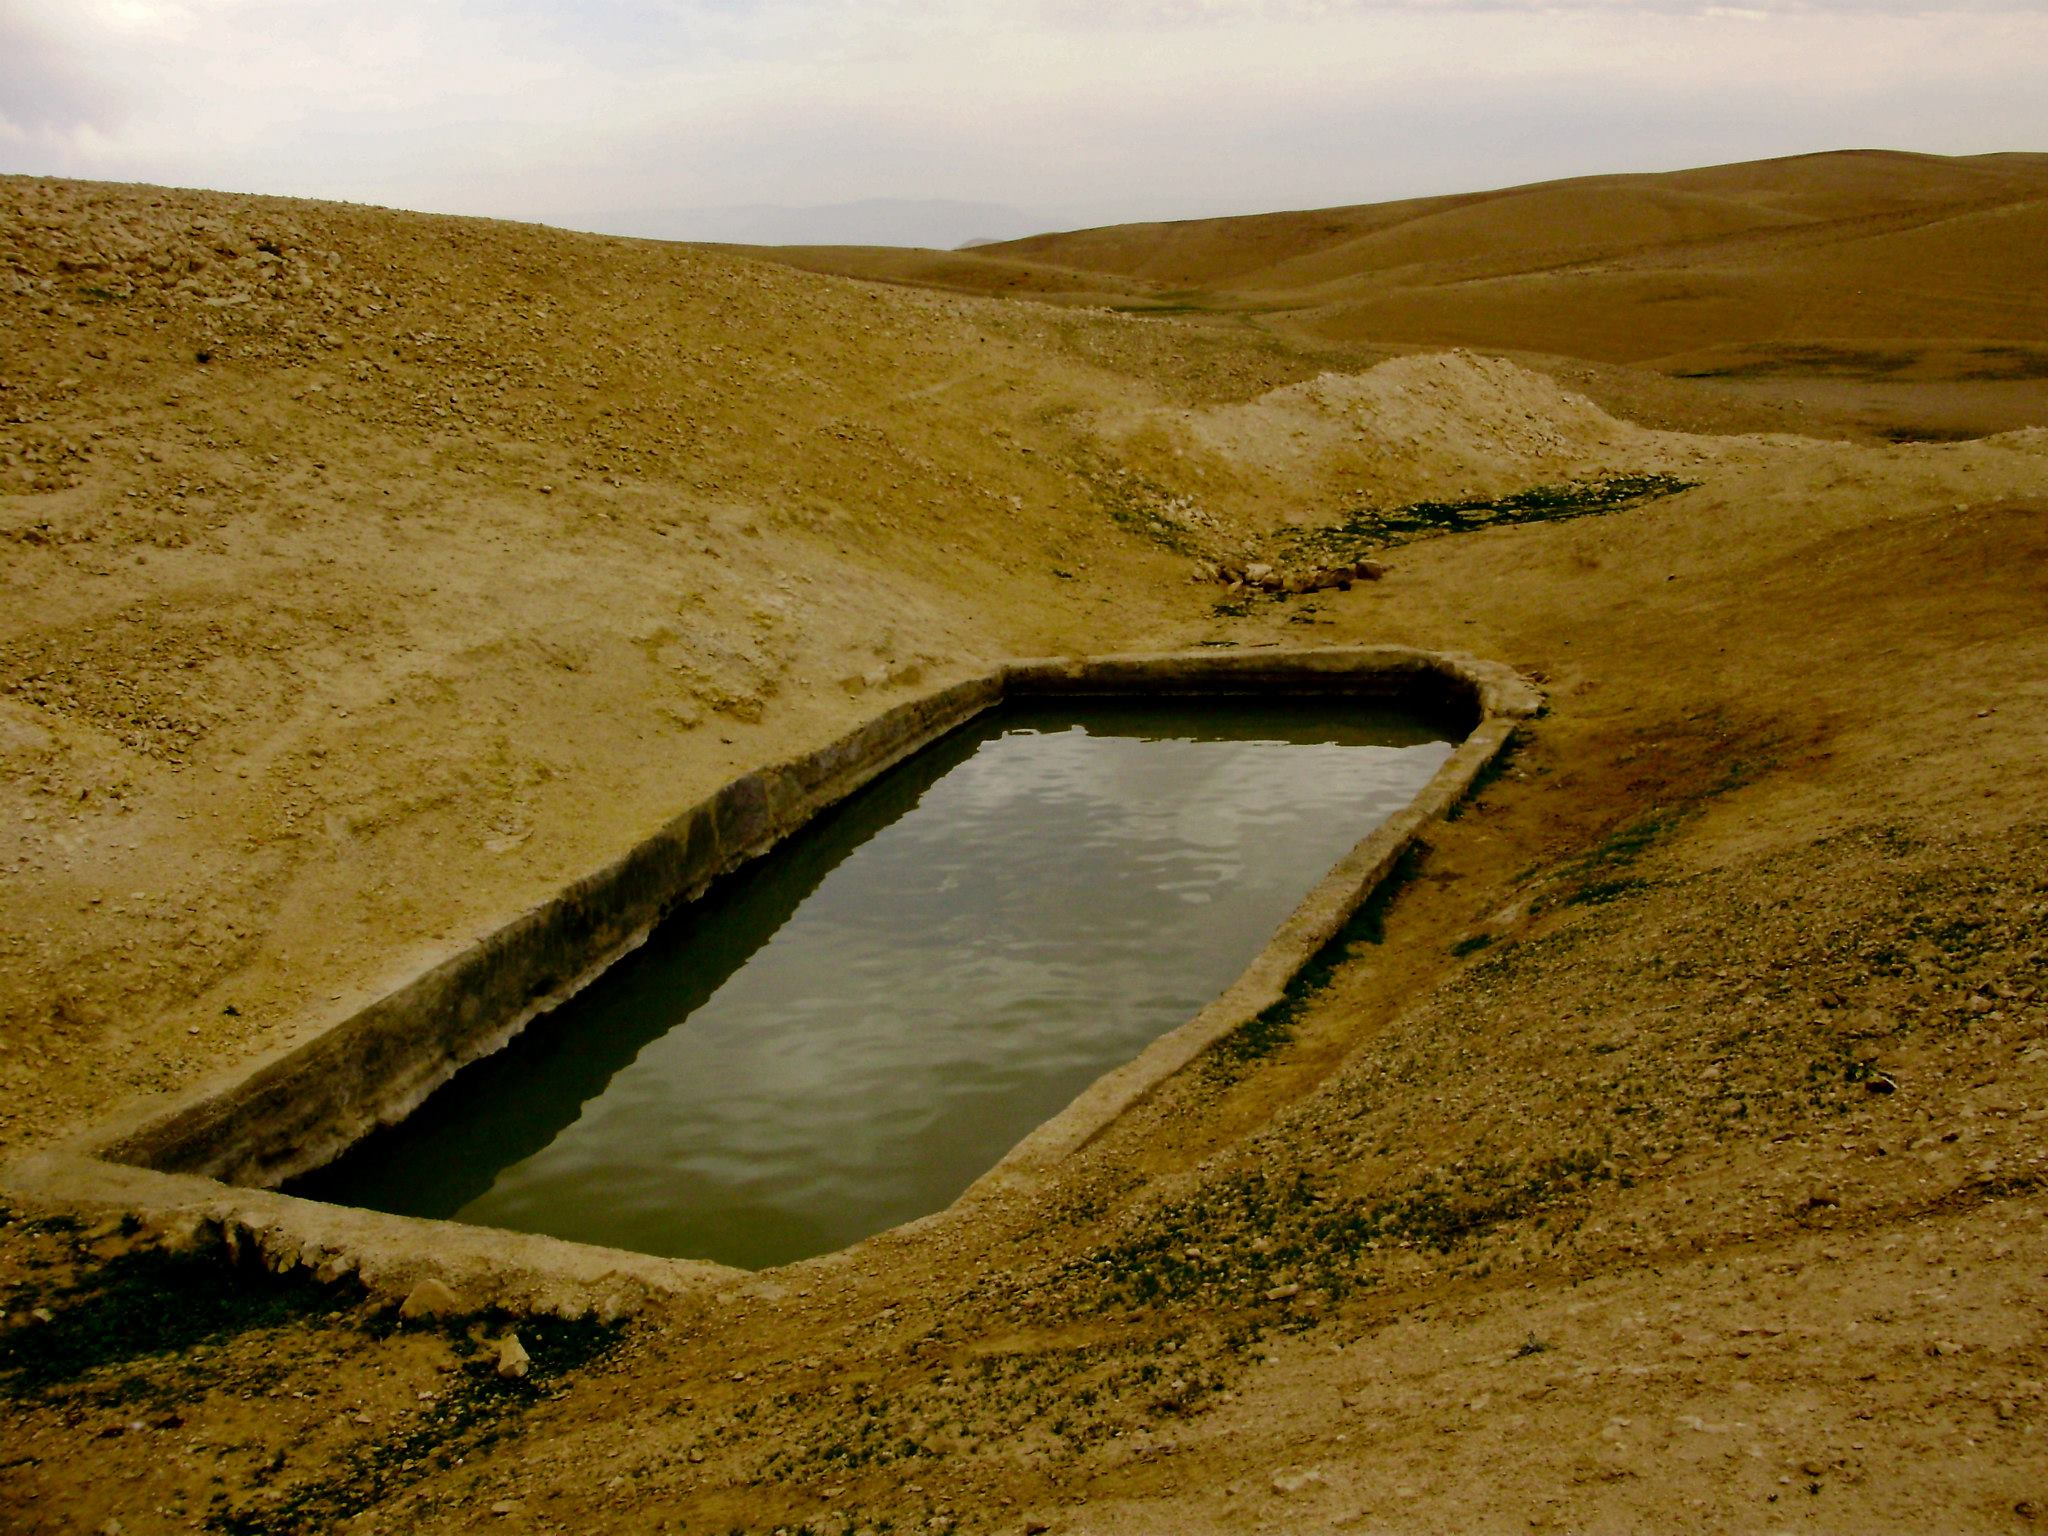 desert pool AmitaiAsif